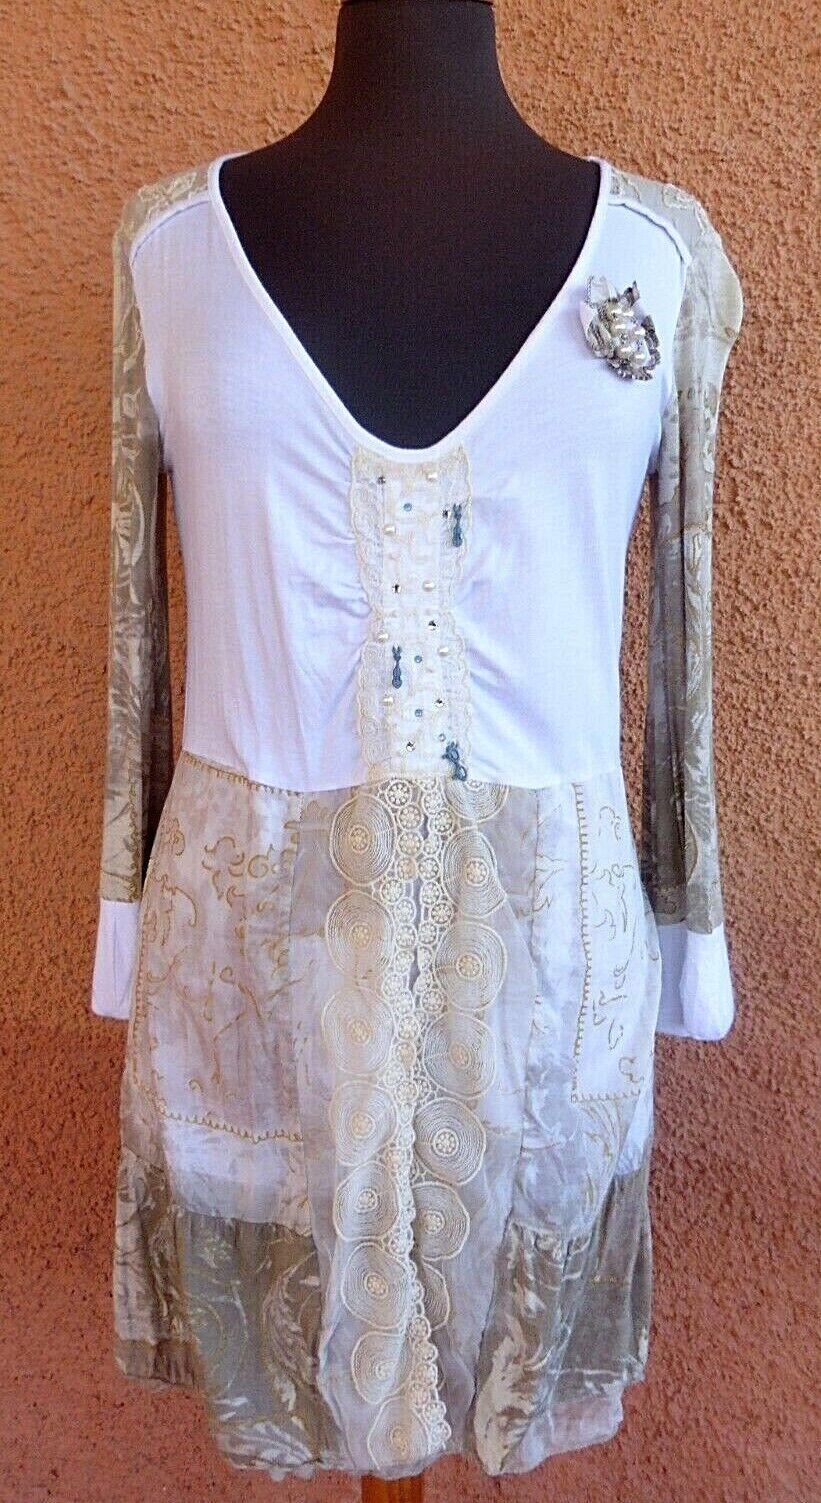 Ladies Elisa Cavaletti Club White Stretch Tunic/Dress Size S (pics size)